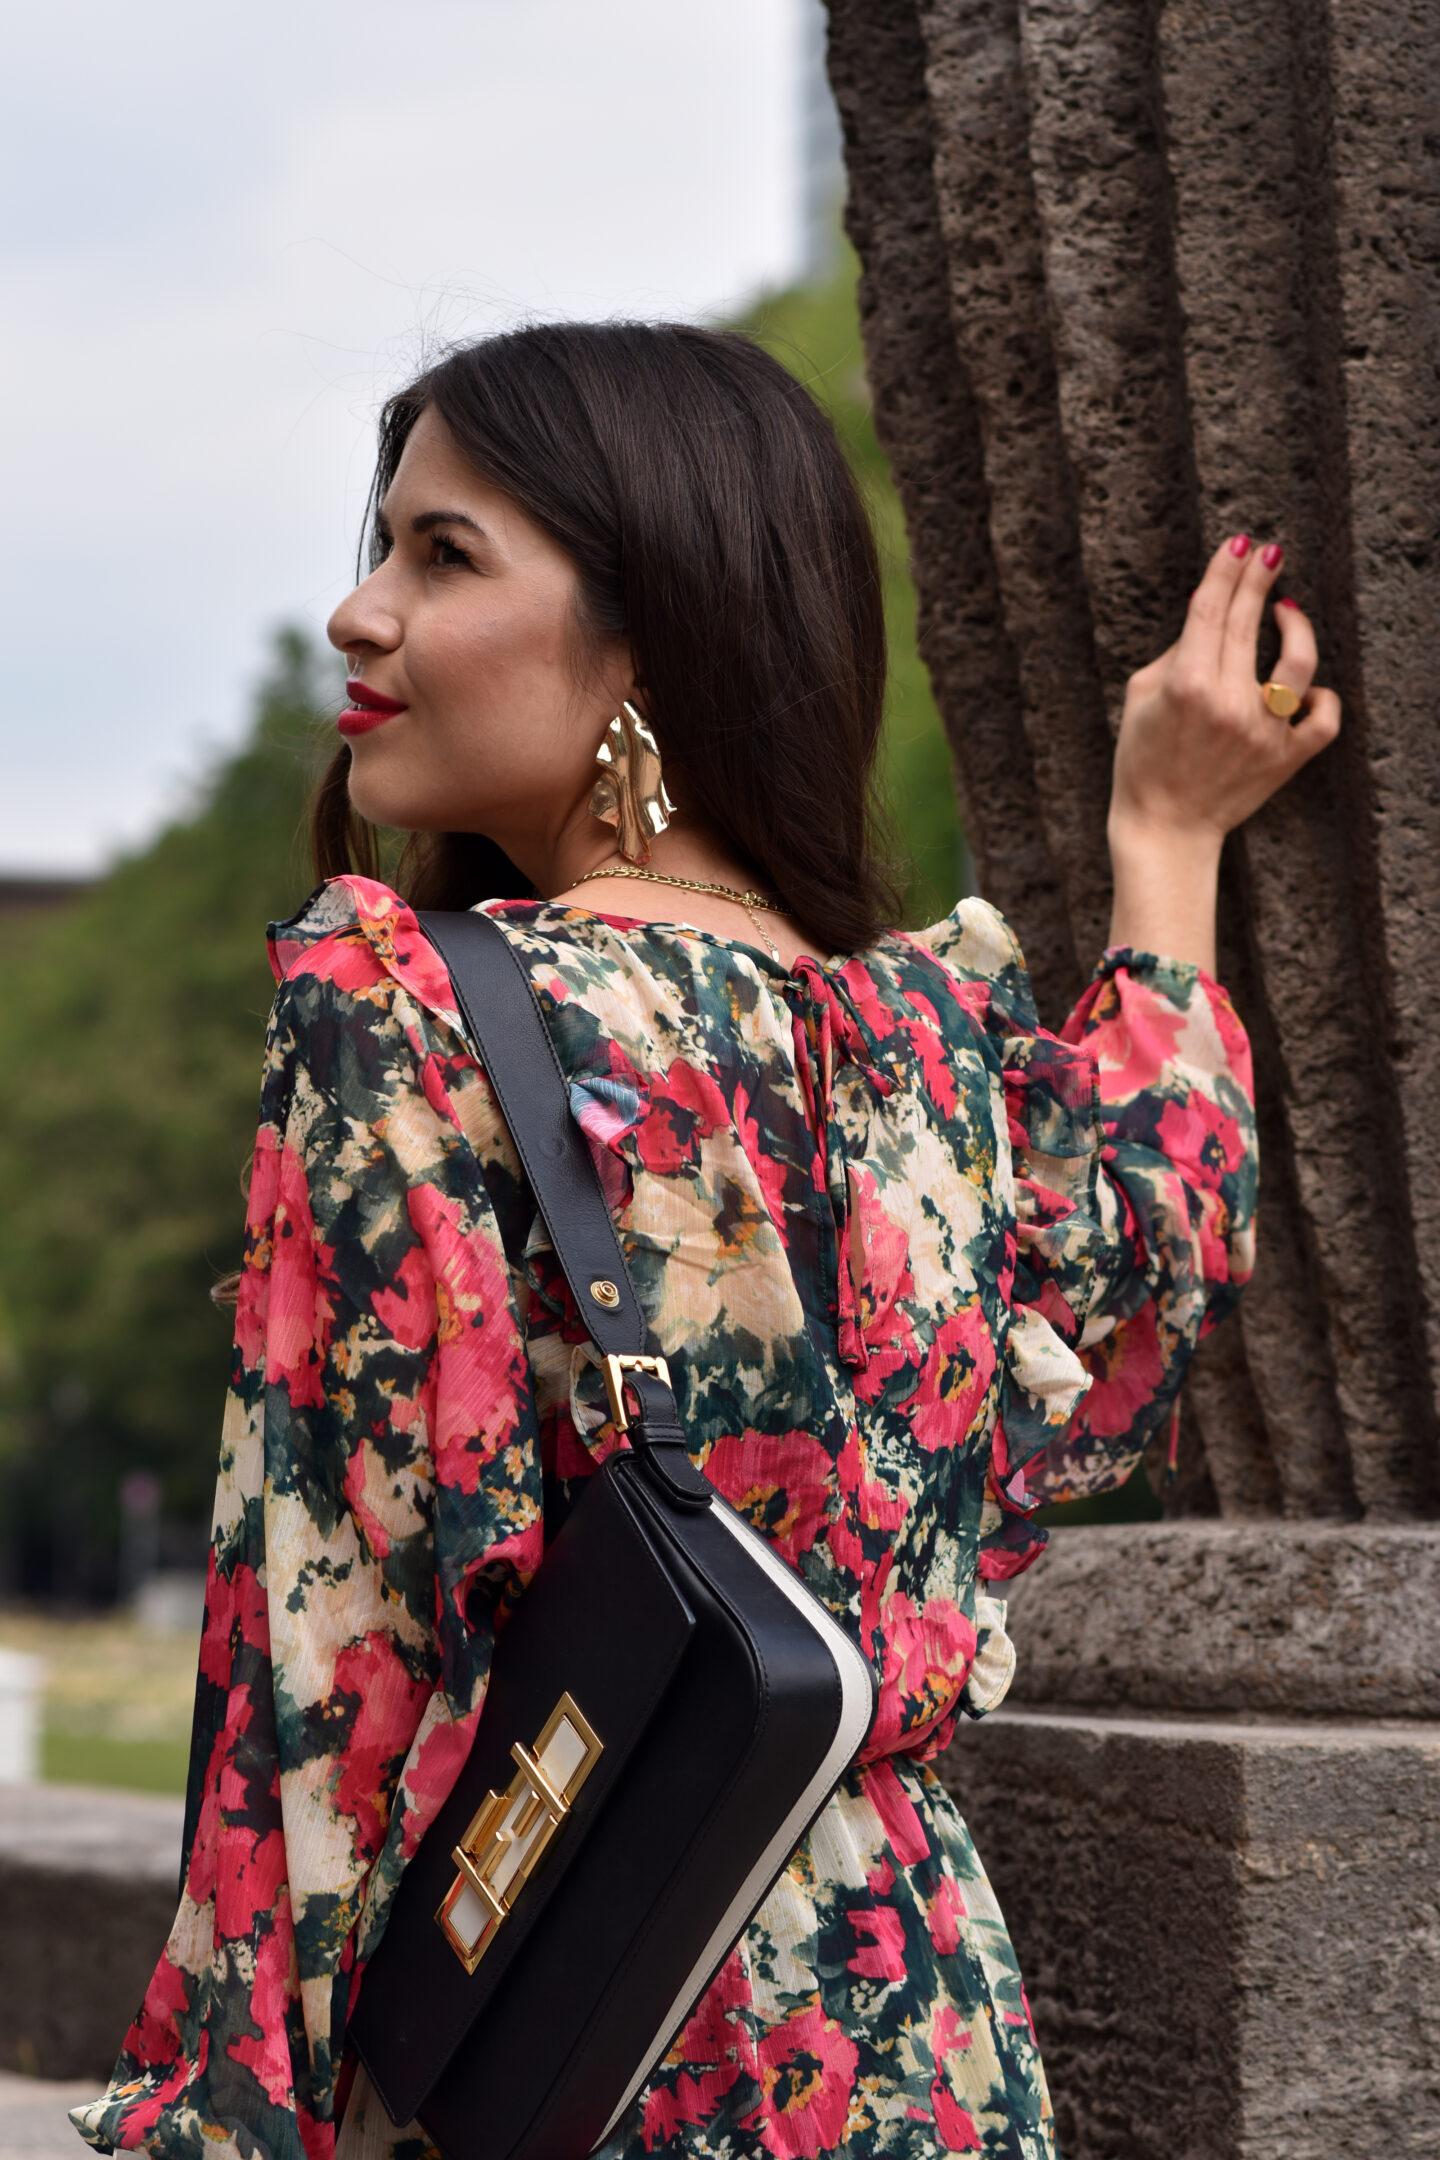 Das elegante Blumenkleid